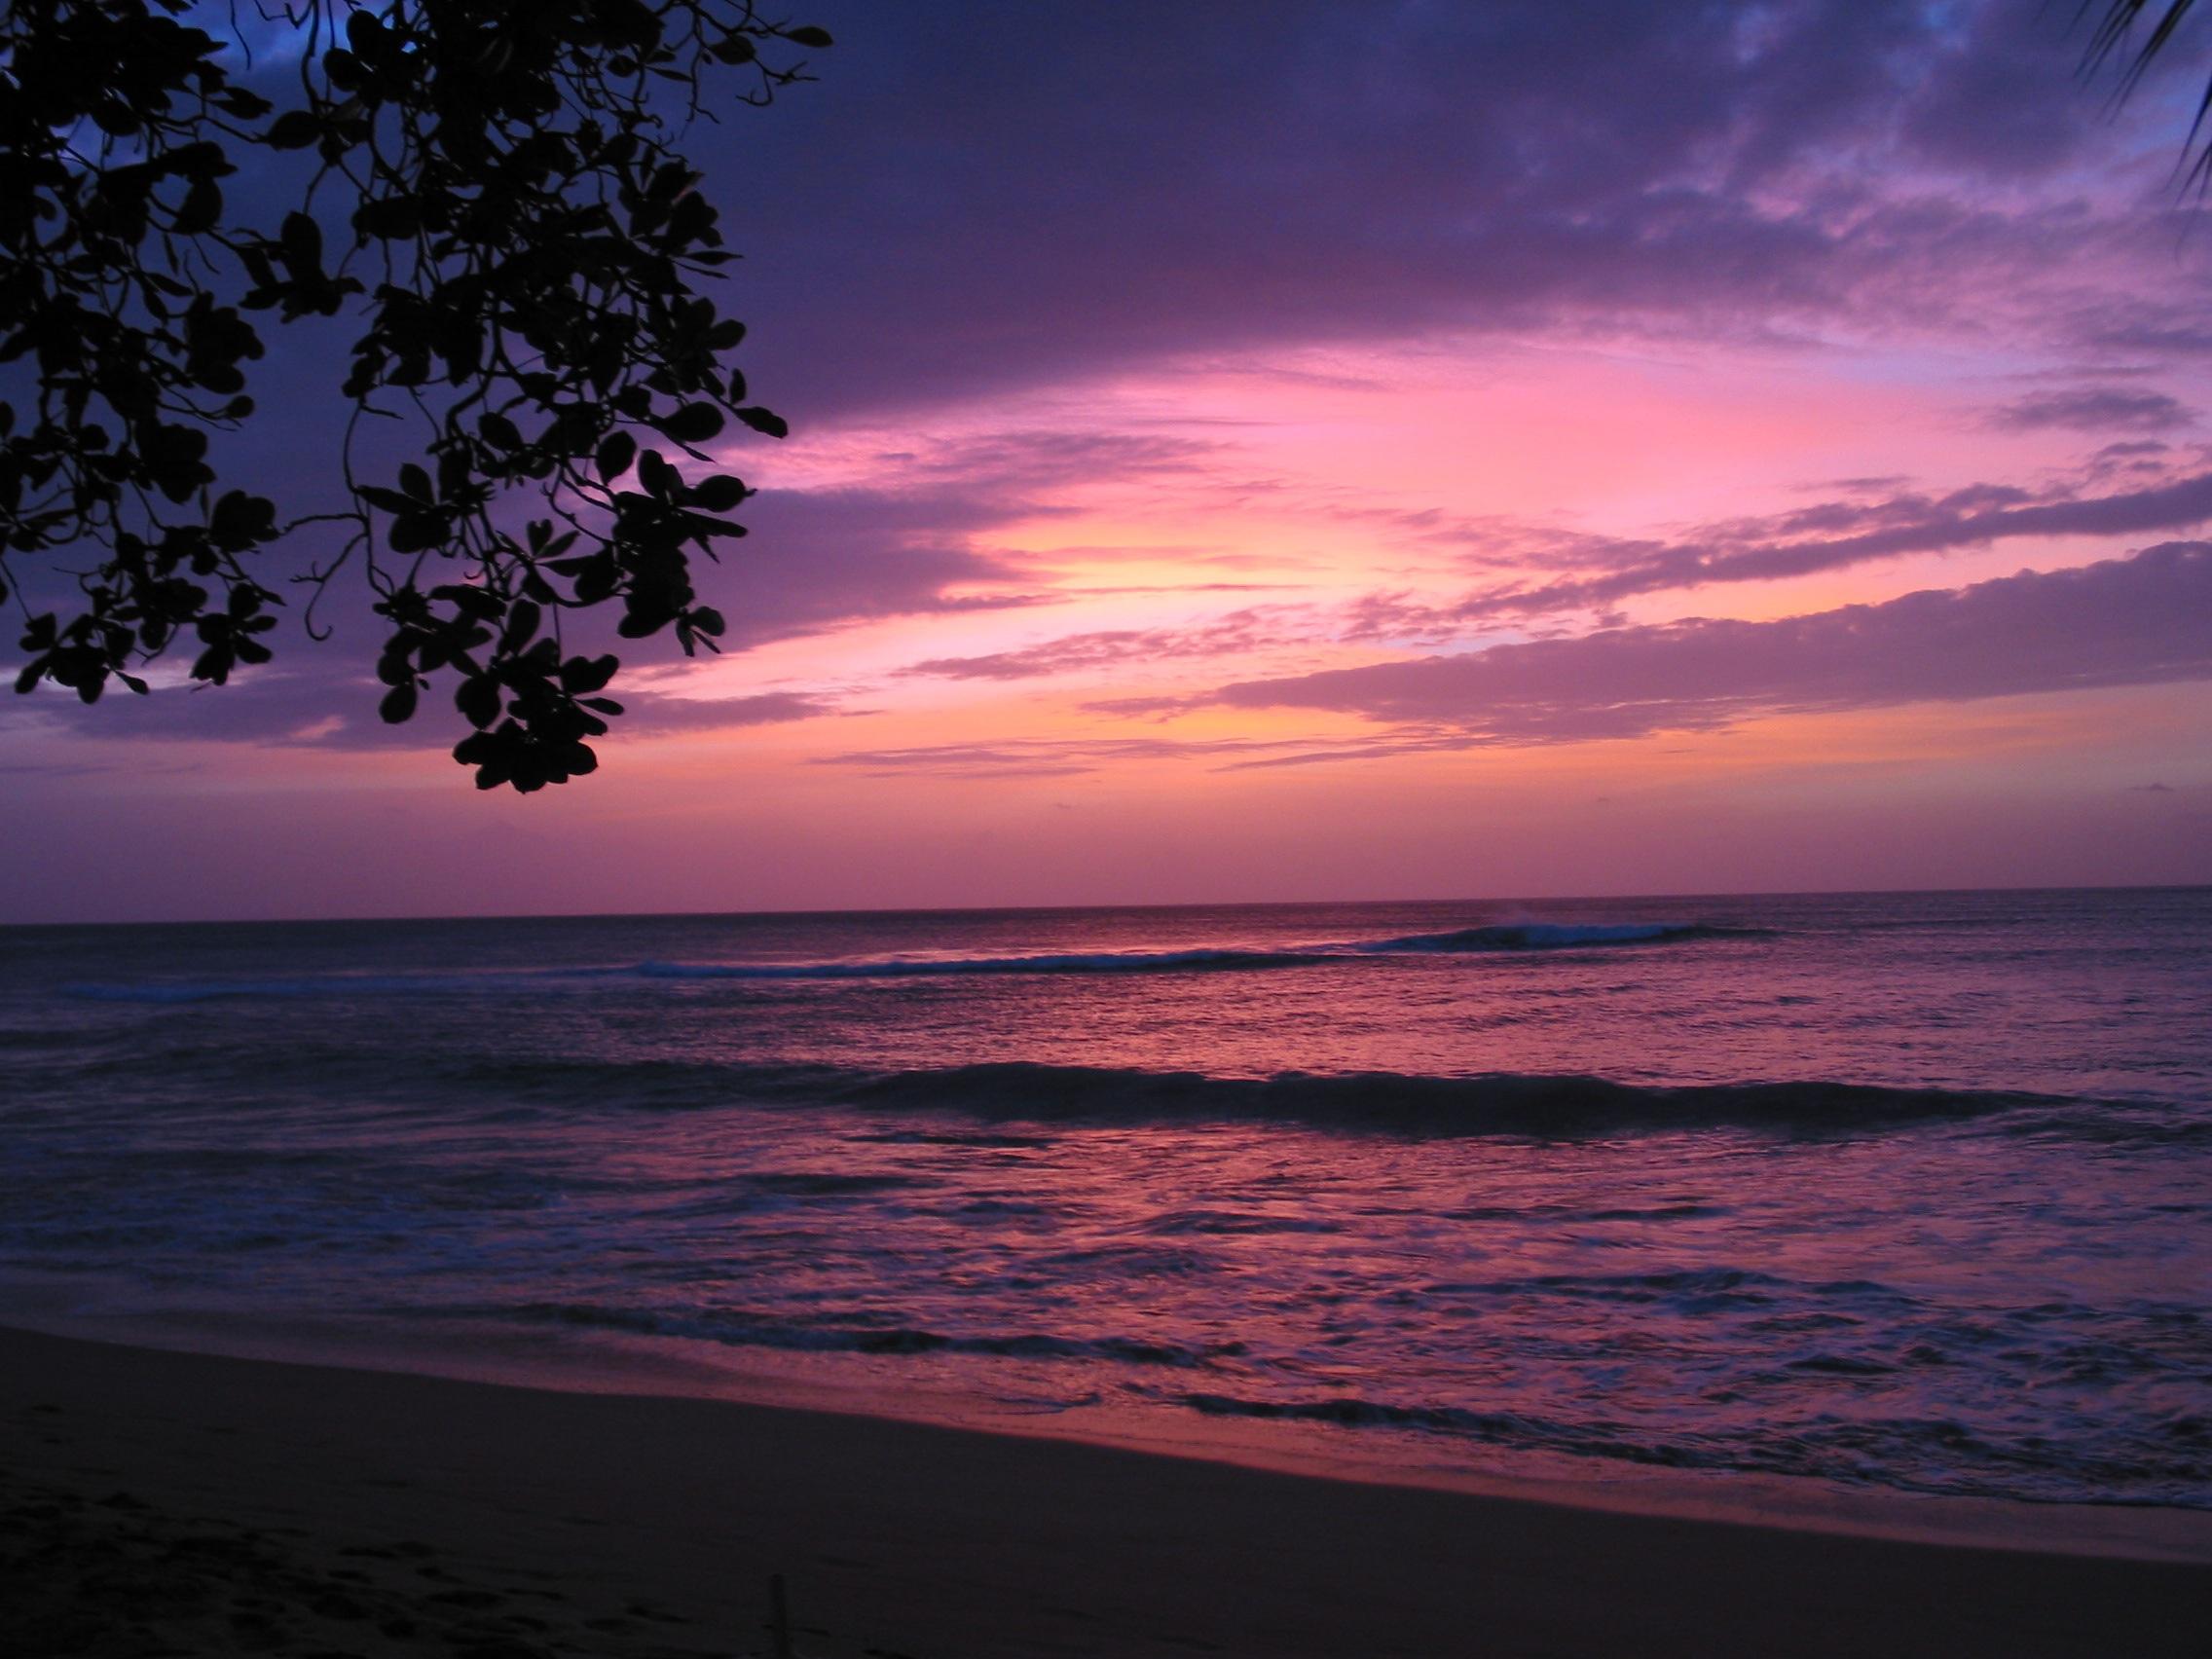 Free Images Beach Landscape Sea Coast Nature Sand Ocean Horizon Cloud Sun Sunrise Sunset Sunlight Morning Shore Dawn Summer Vacation